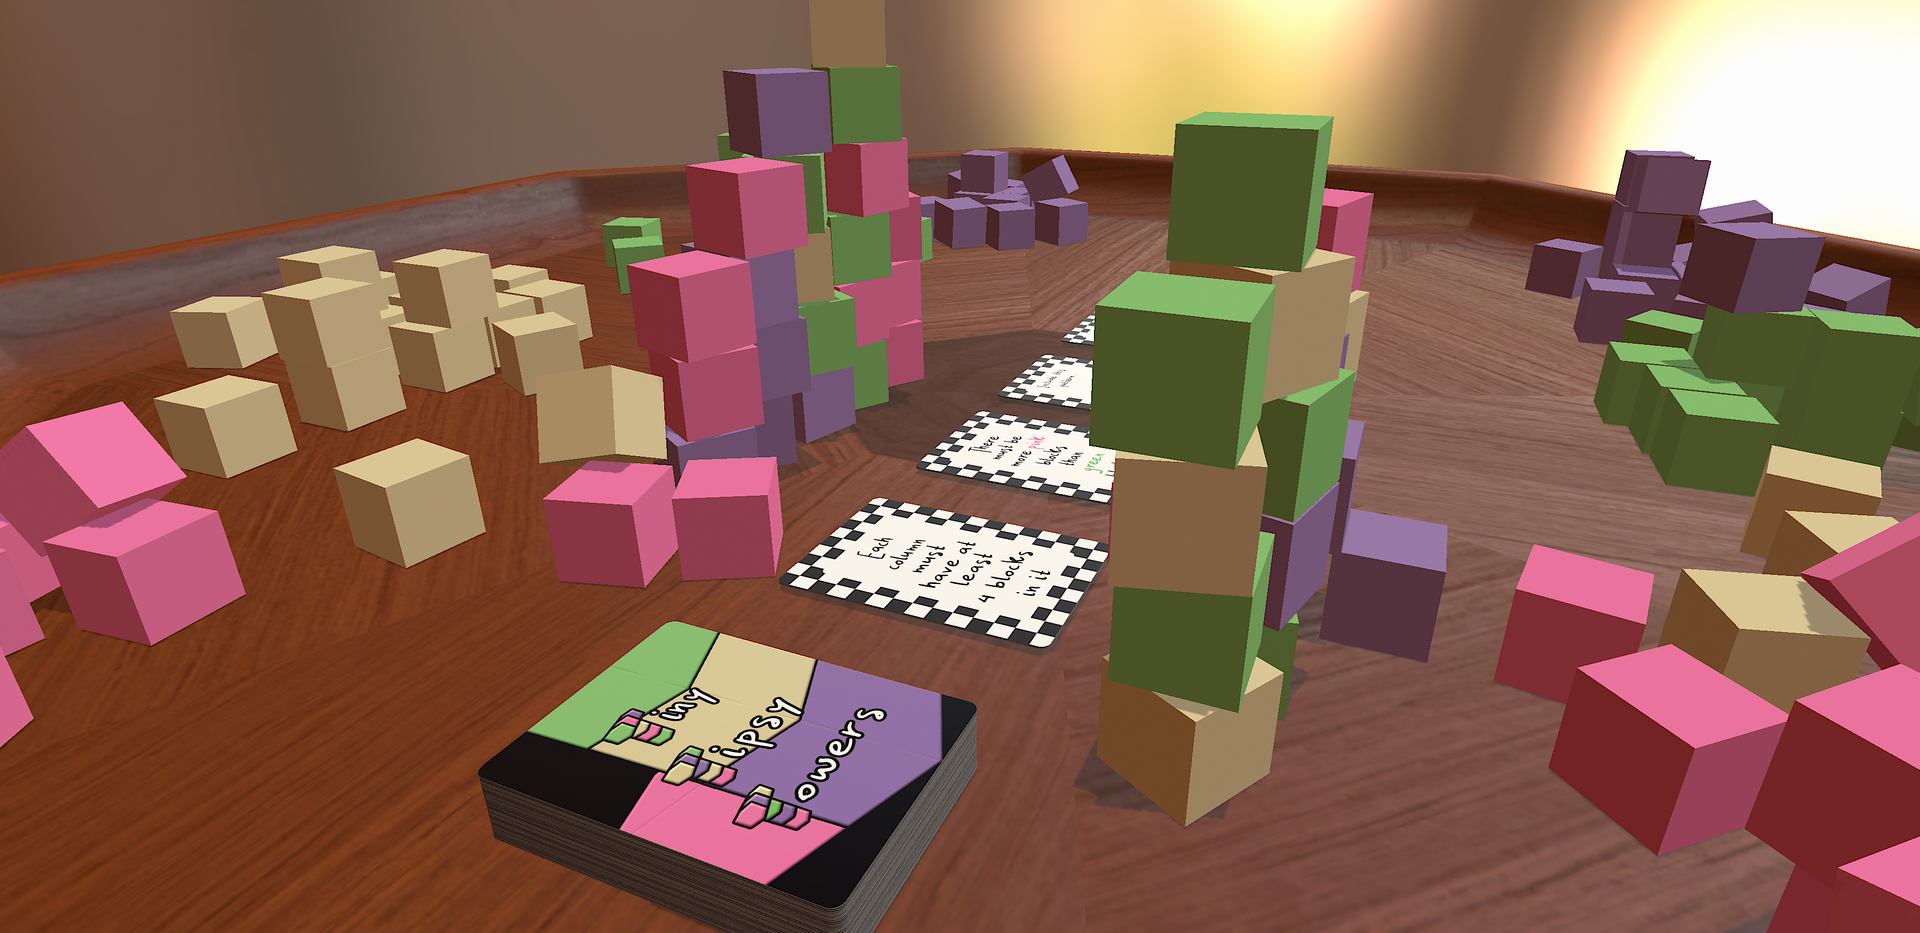 Game Screenshot 9.PNG